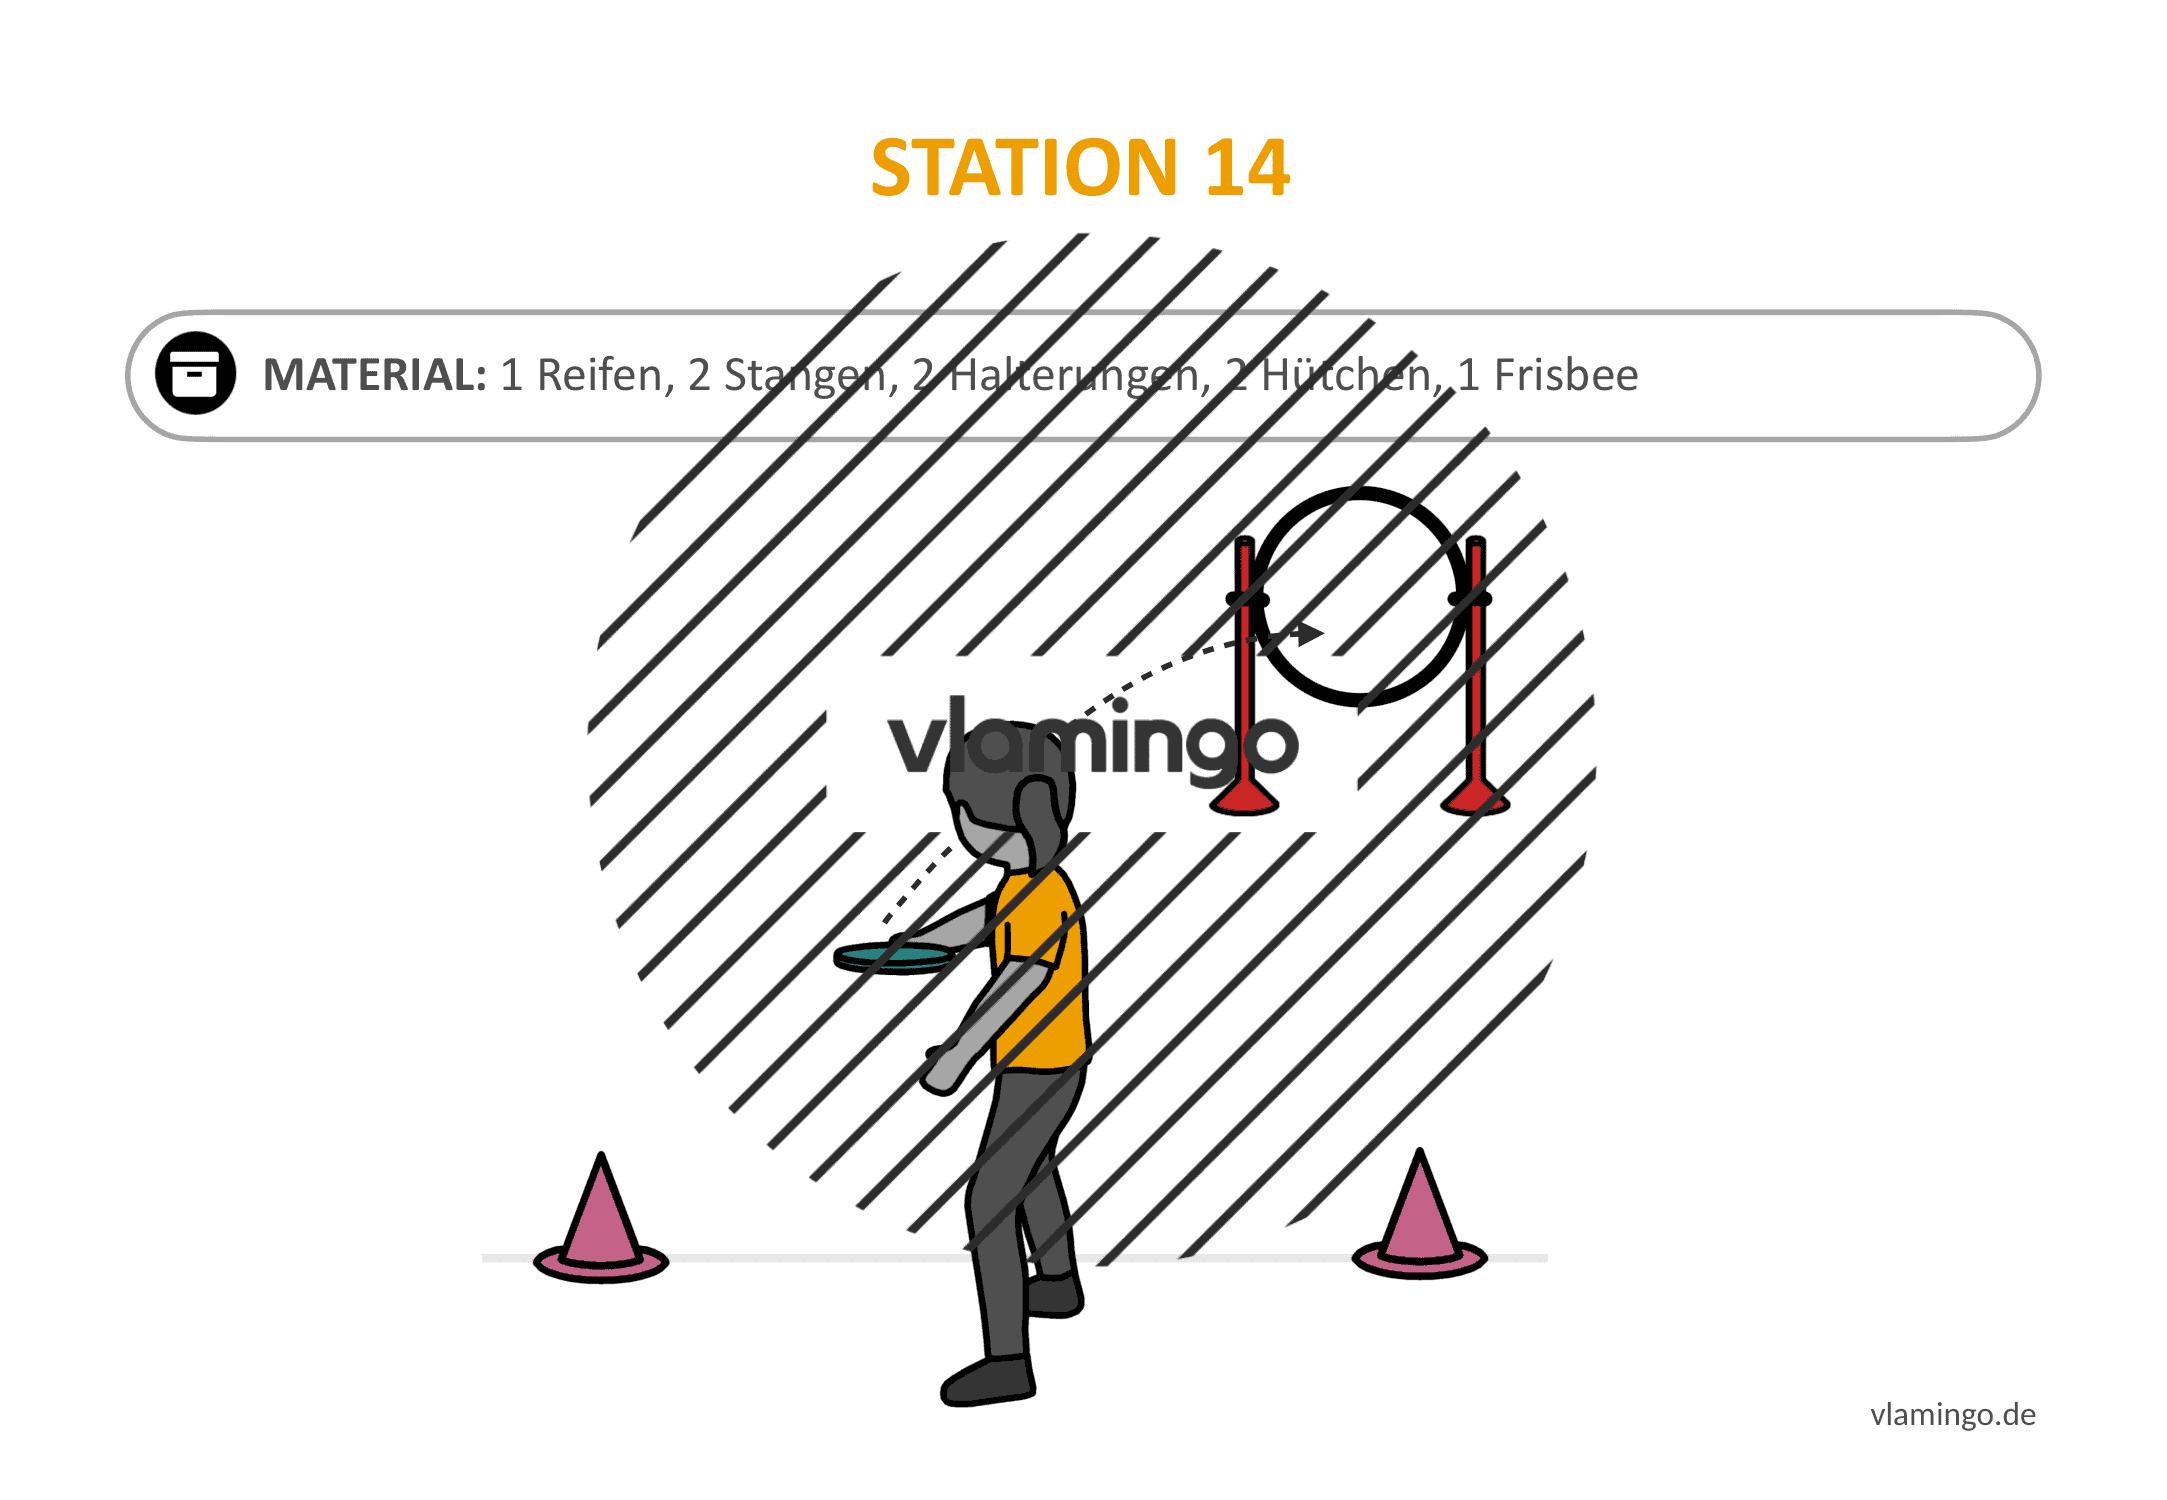 Frisbeegolf (Disc-Golf) - Station 14